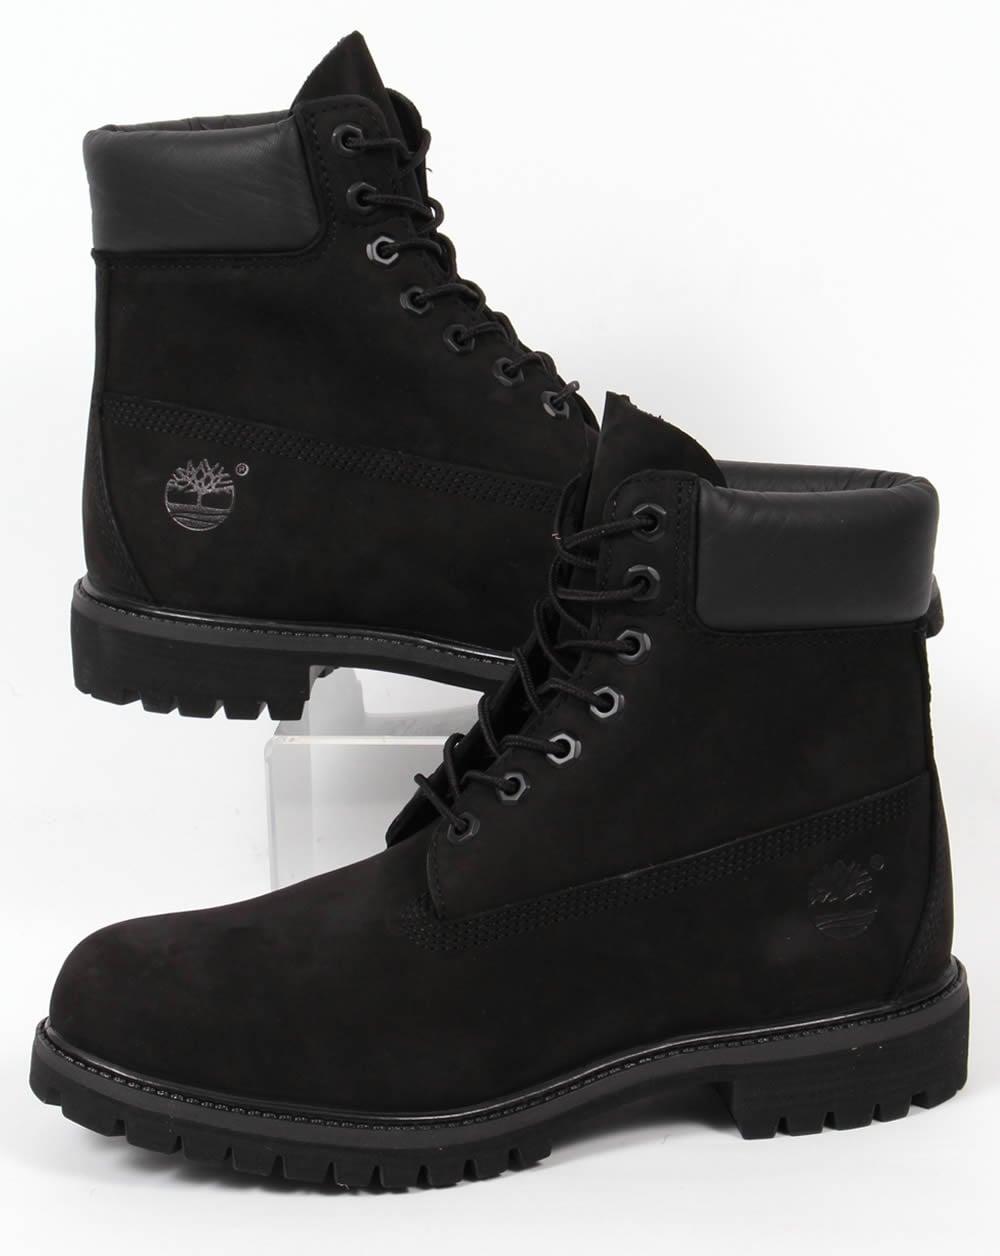 Timberland Timberland Icon 6 Inch Premium Boots Black Nubuck d00e74e22a02